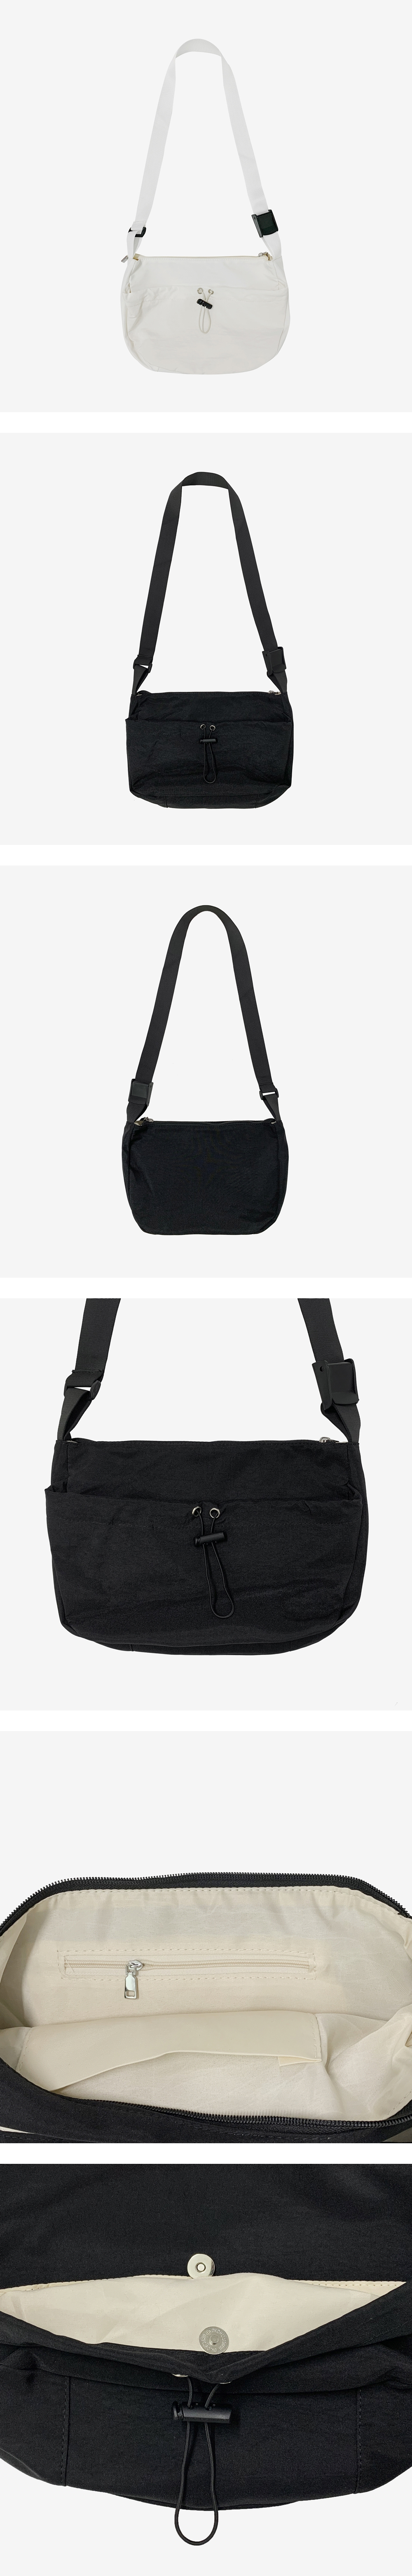 pieta string crossbody bag